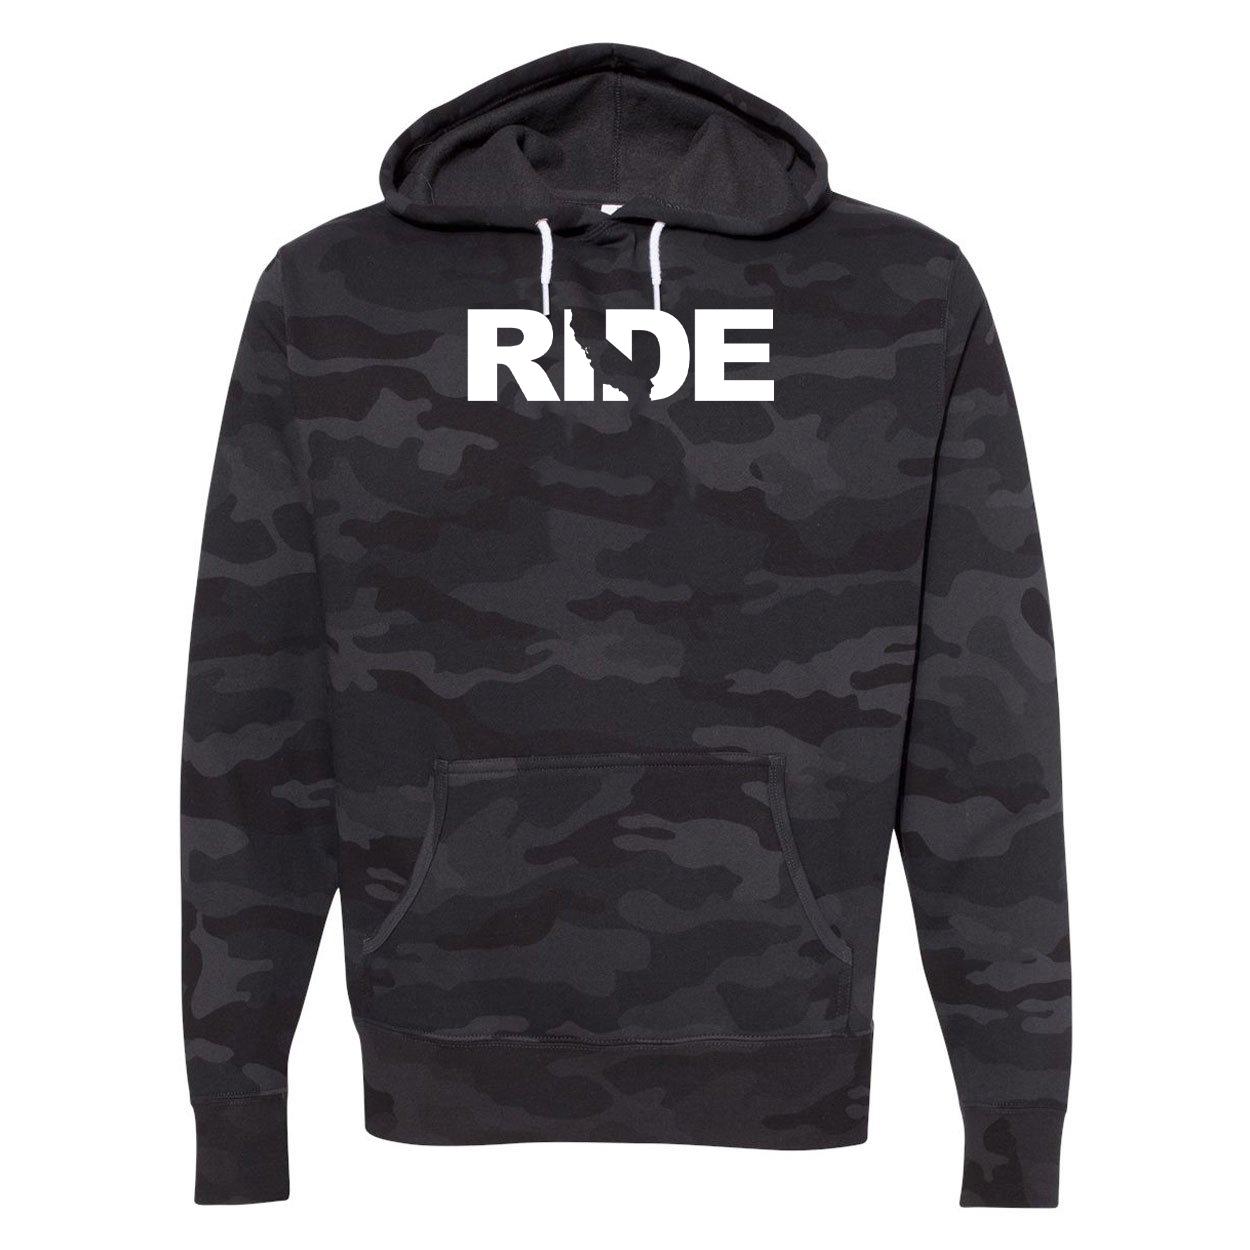 Ride California Classic Unisex Hooded Sweatshirt Black Camo (White Logo)